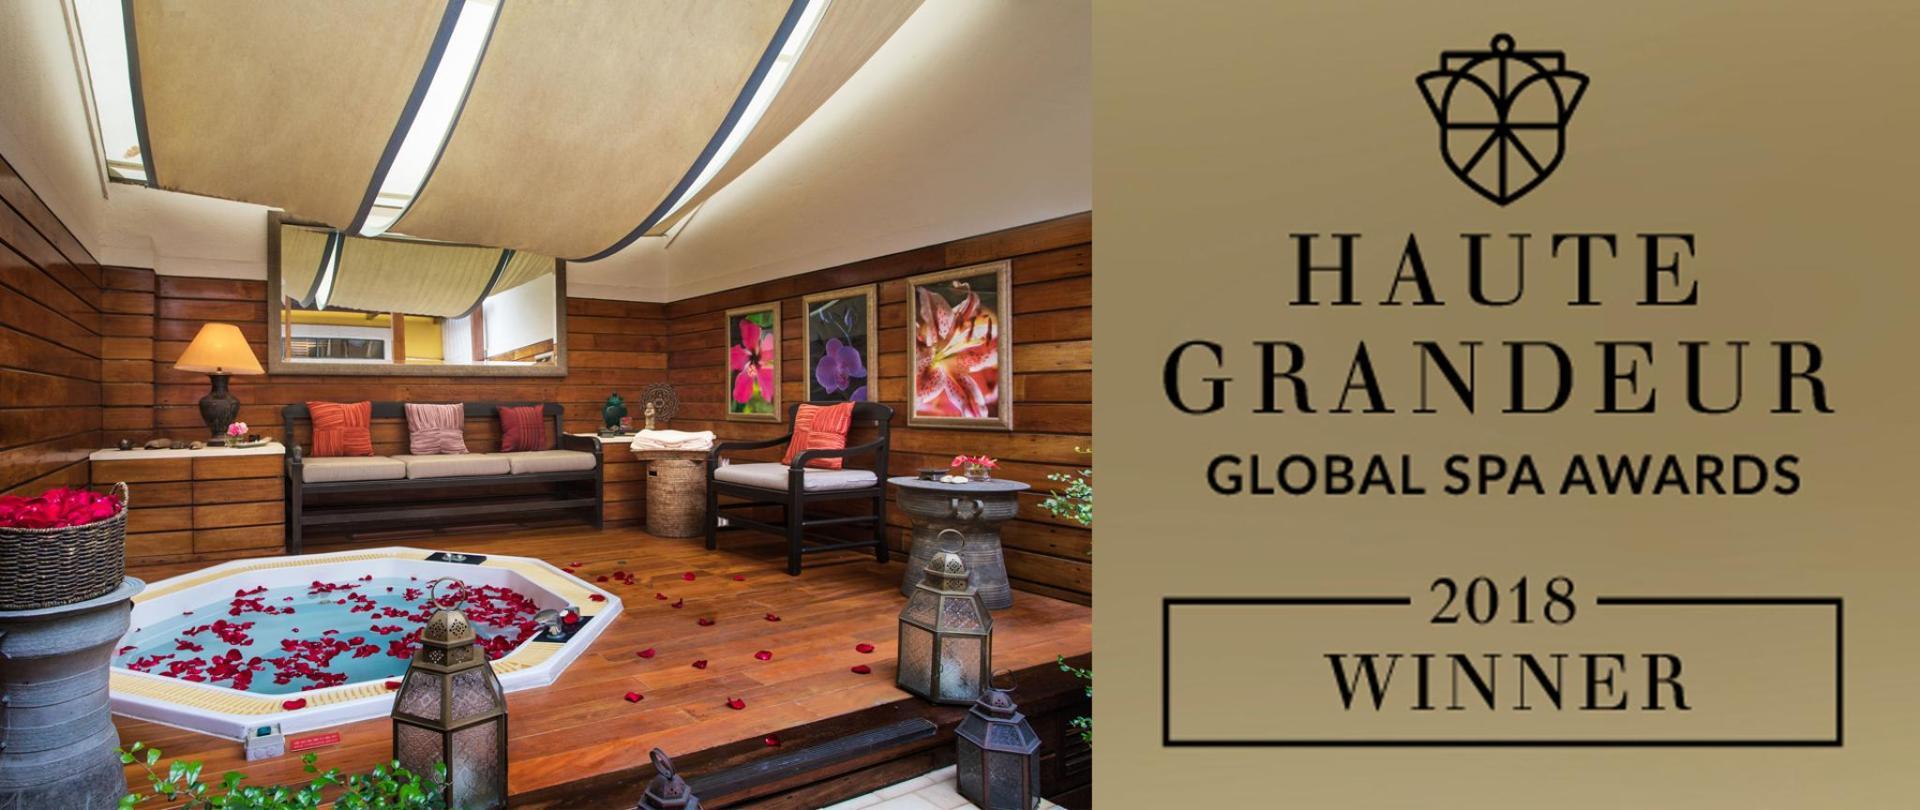 HG Award-banner spa.jpg